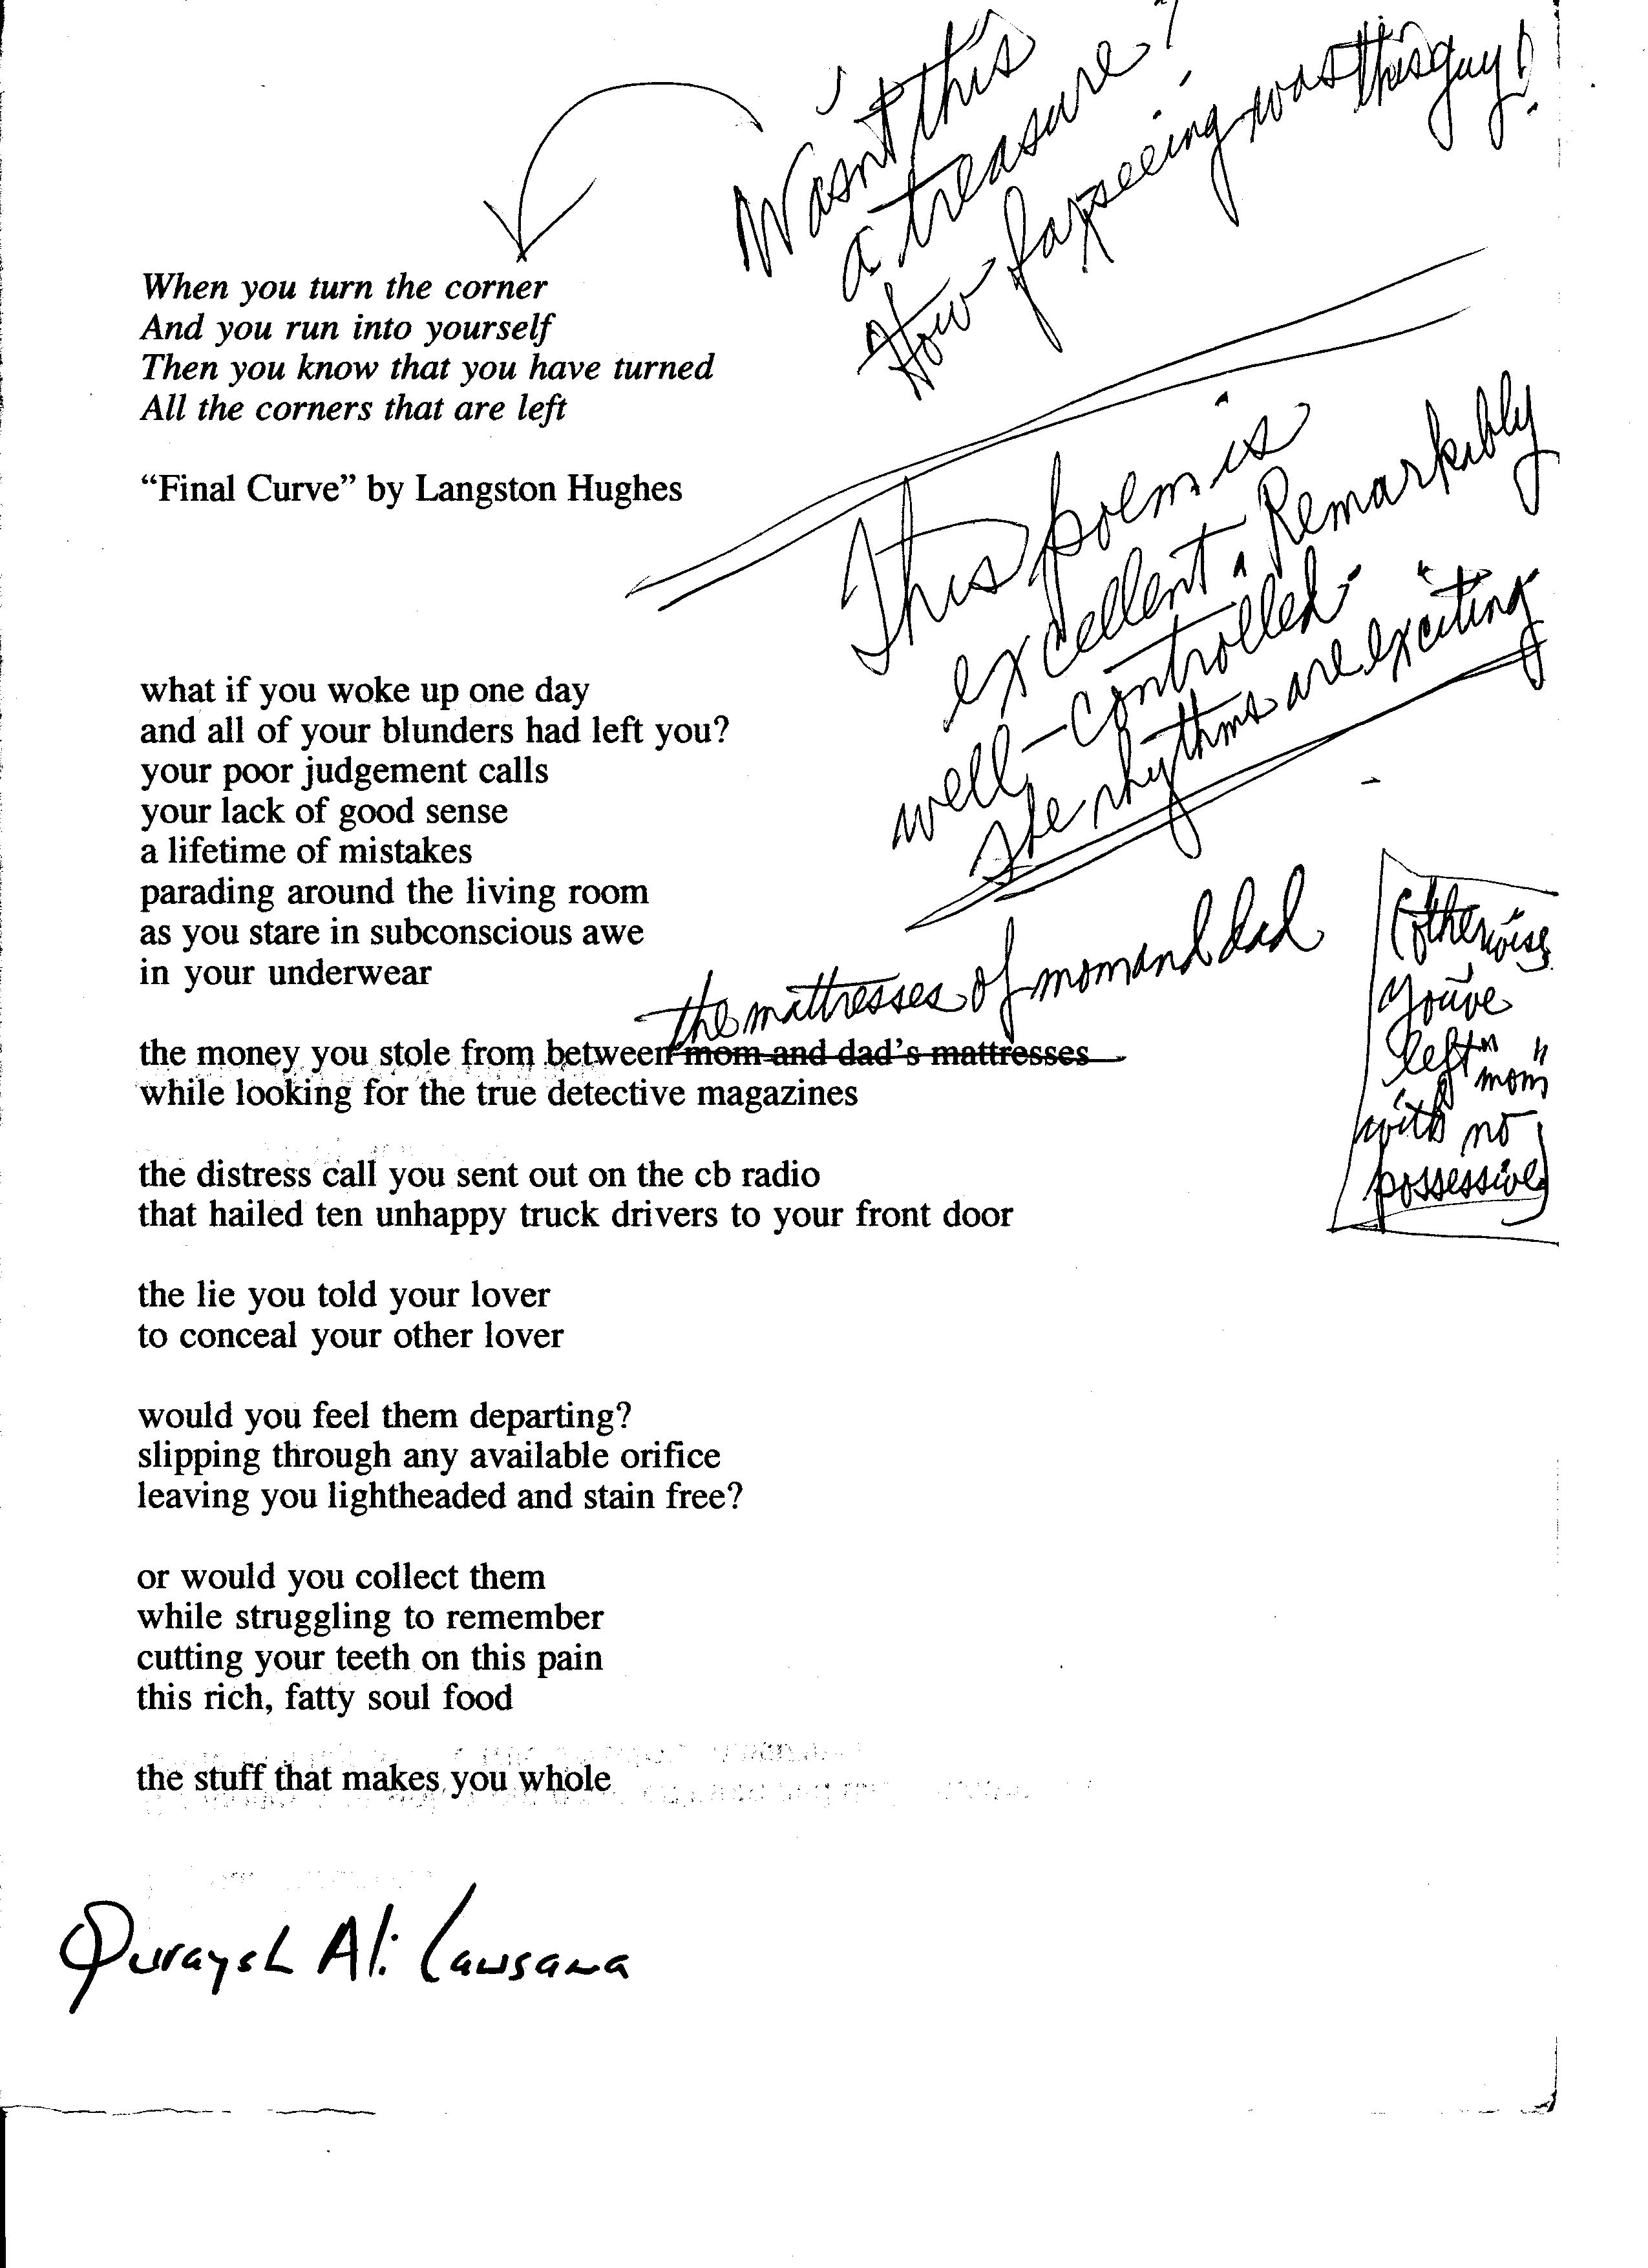 RevisingThePsalm_Baggage